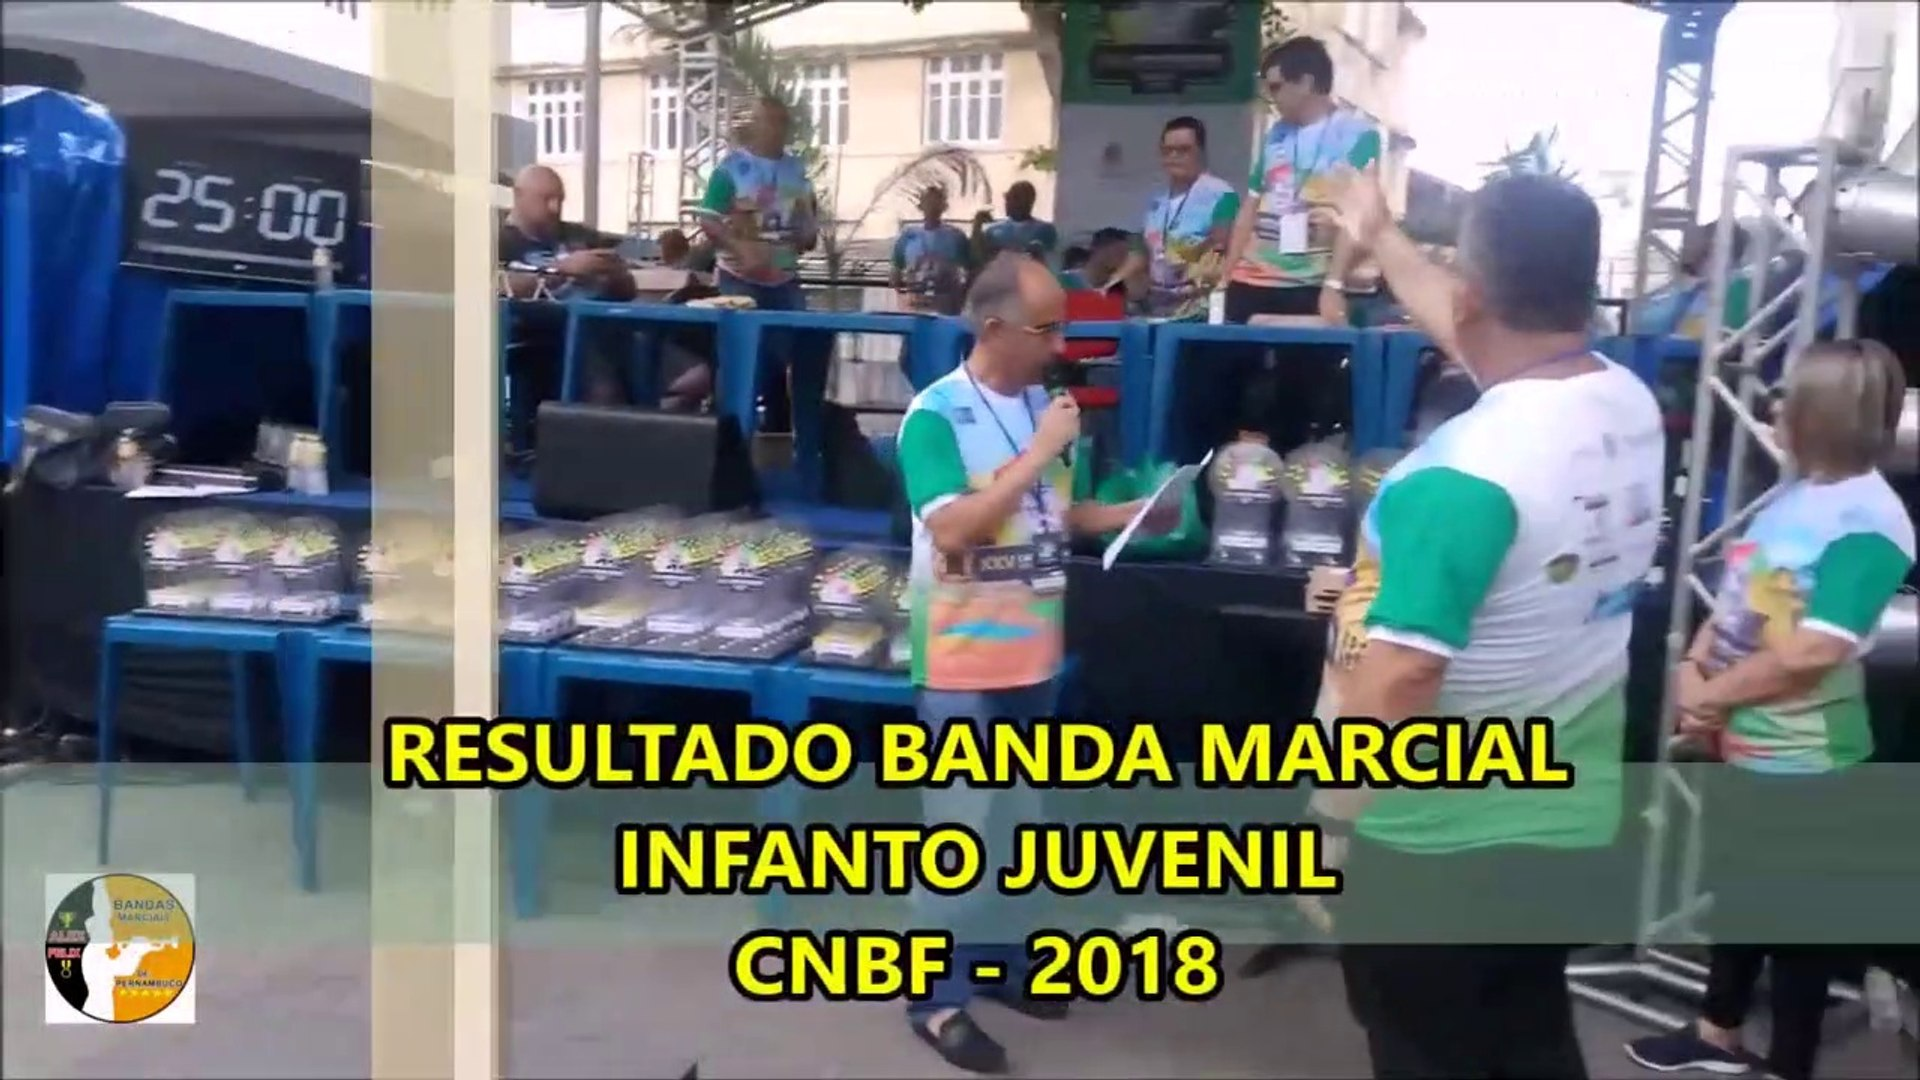 CNBF 2018 - RESULTADO BANDA MARCIAL INFANTO JUVENIL - CAMPEONATO NACIONAL DE BANDAS E FANFARRAS